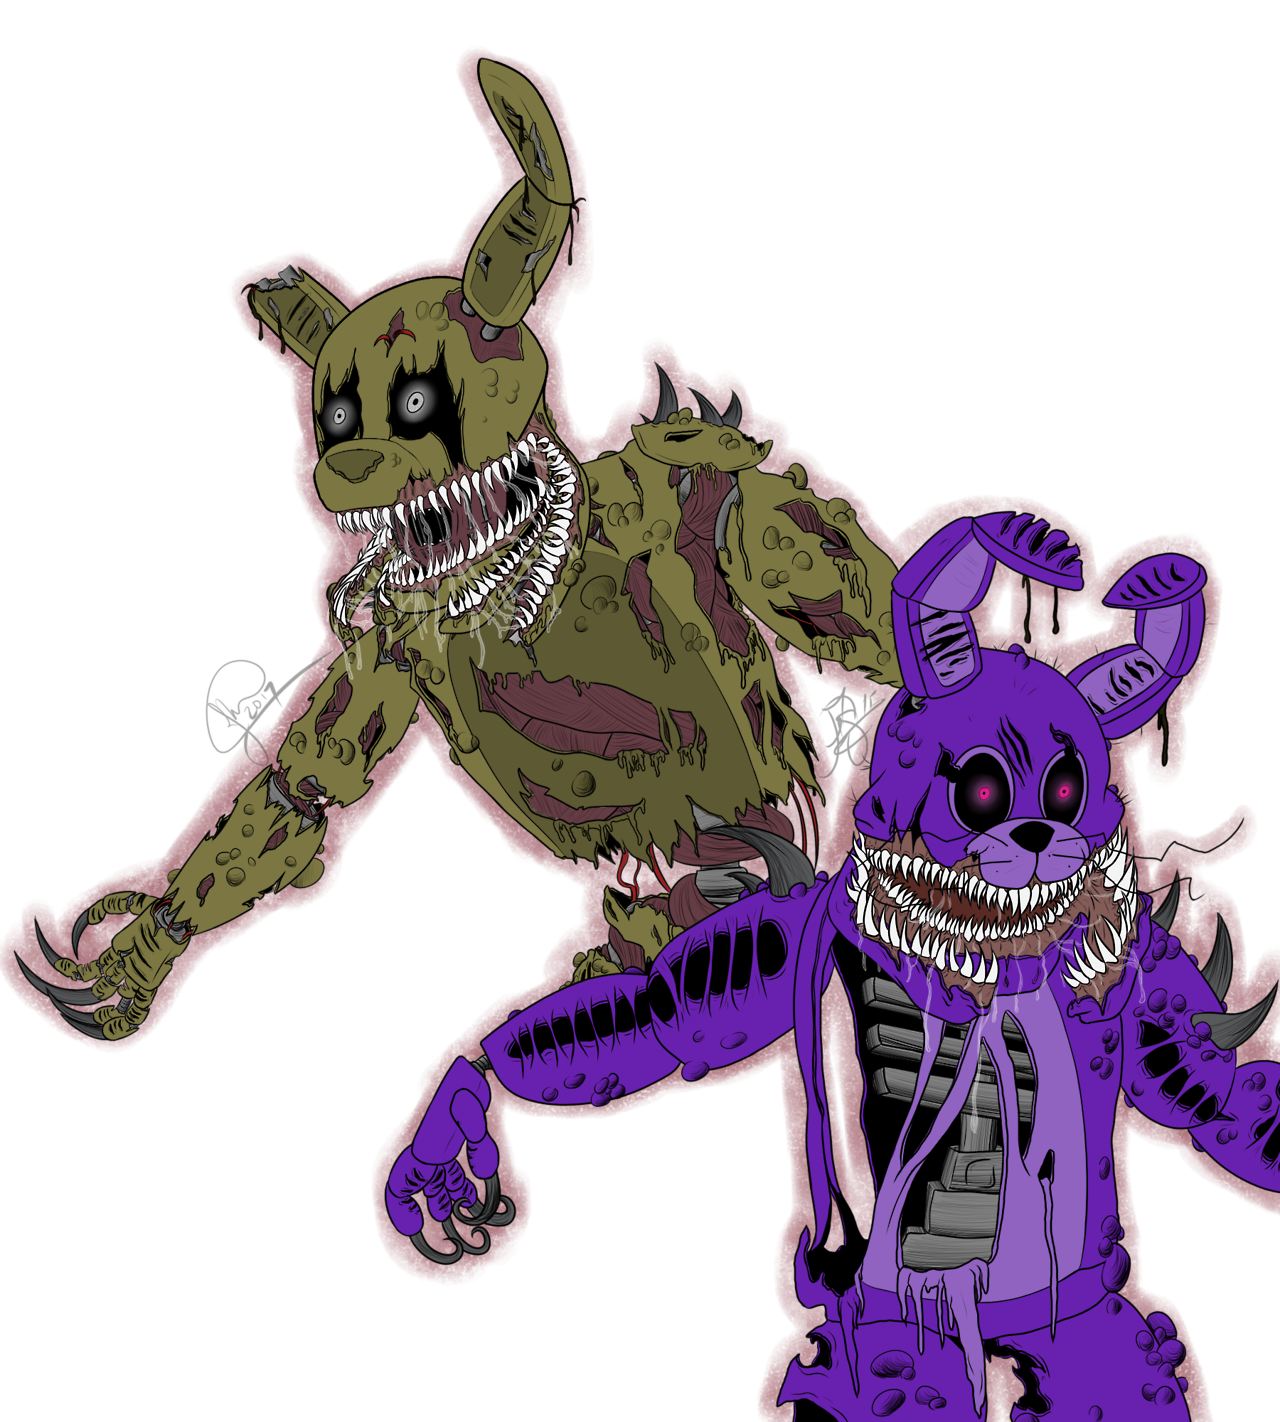 The Twisted Bunnies Speedpaint Https Youtu Be Vrmooat2mfc Fnaf Coloring Pages Fnaf Freddy Fnaf